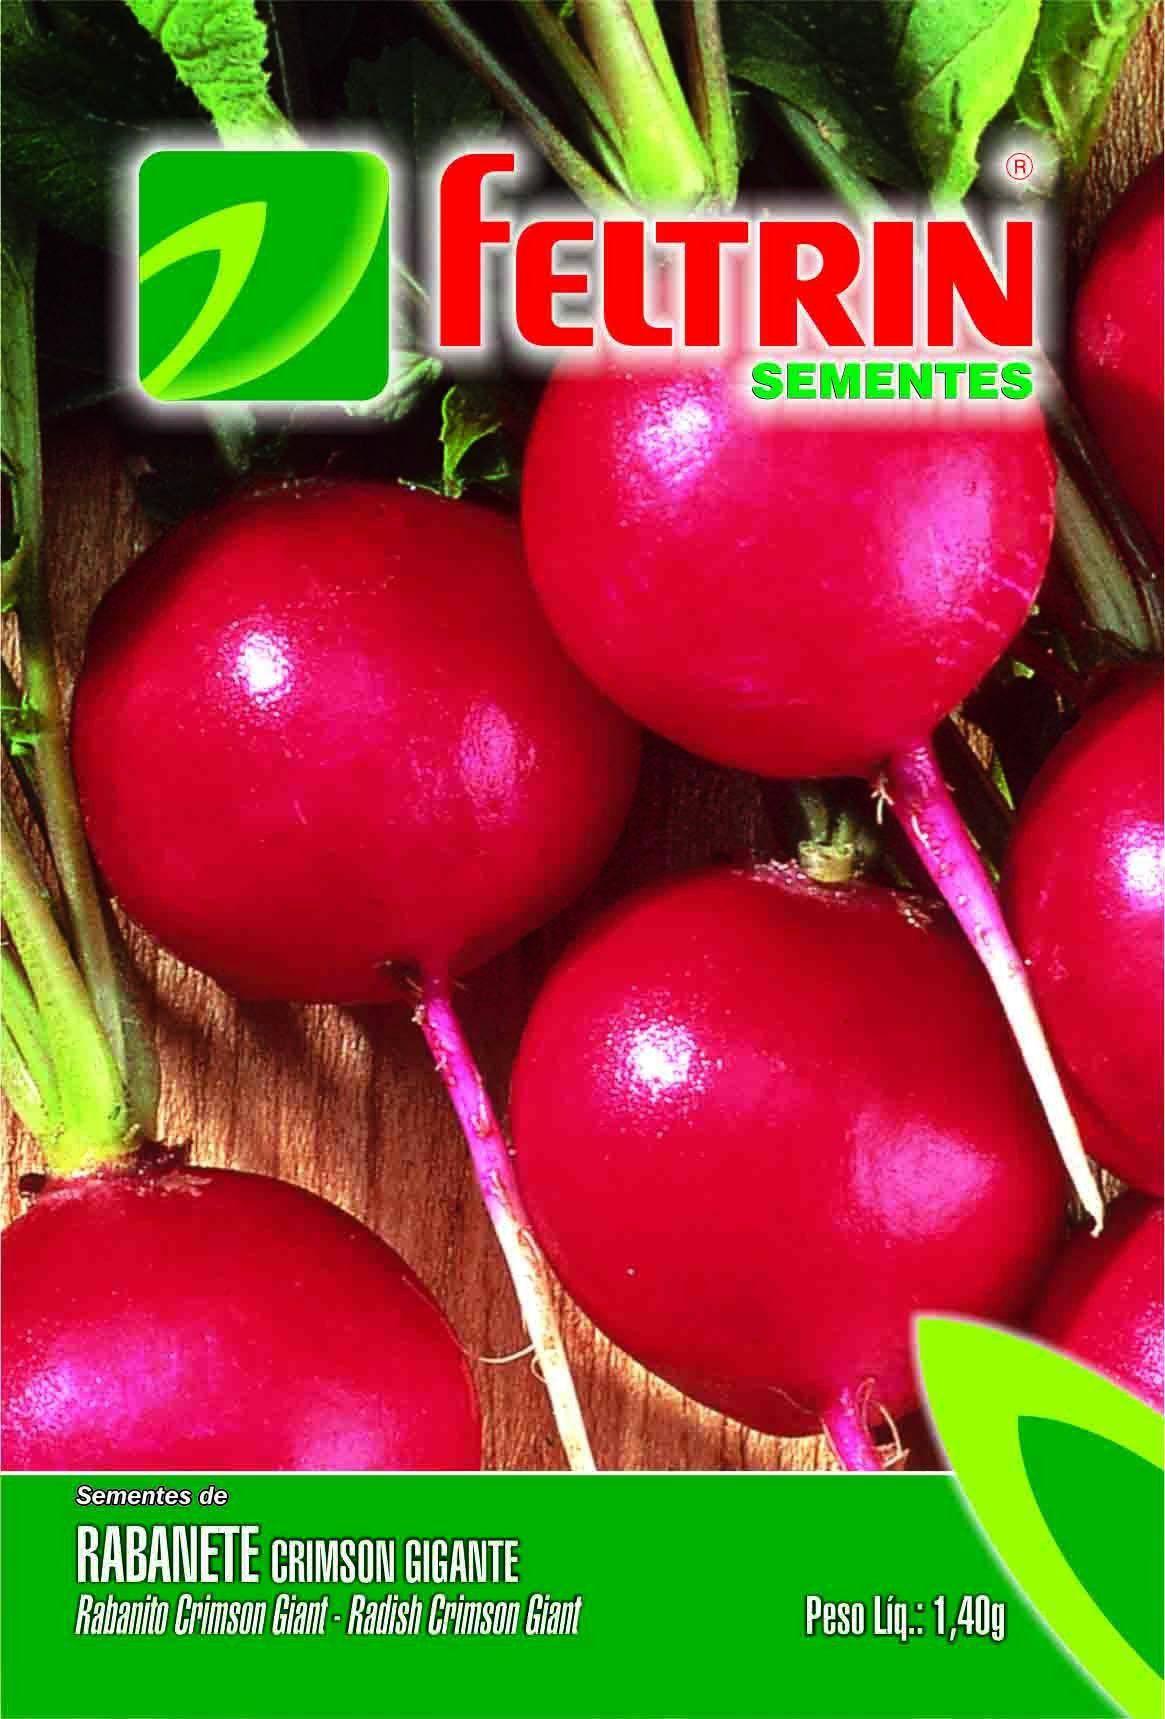 Sementes de Rabanete Crimson Gigante Linha Econômica Feltrin 1,40g